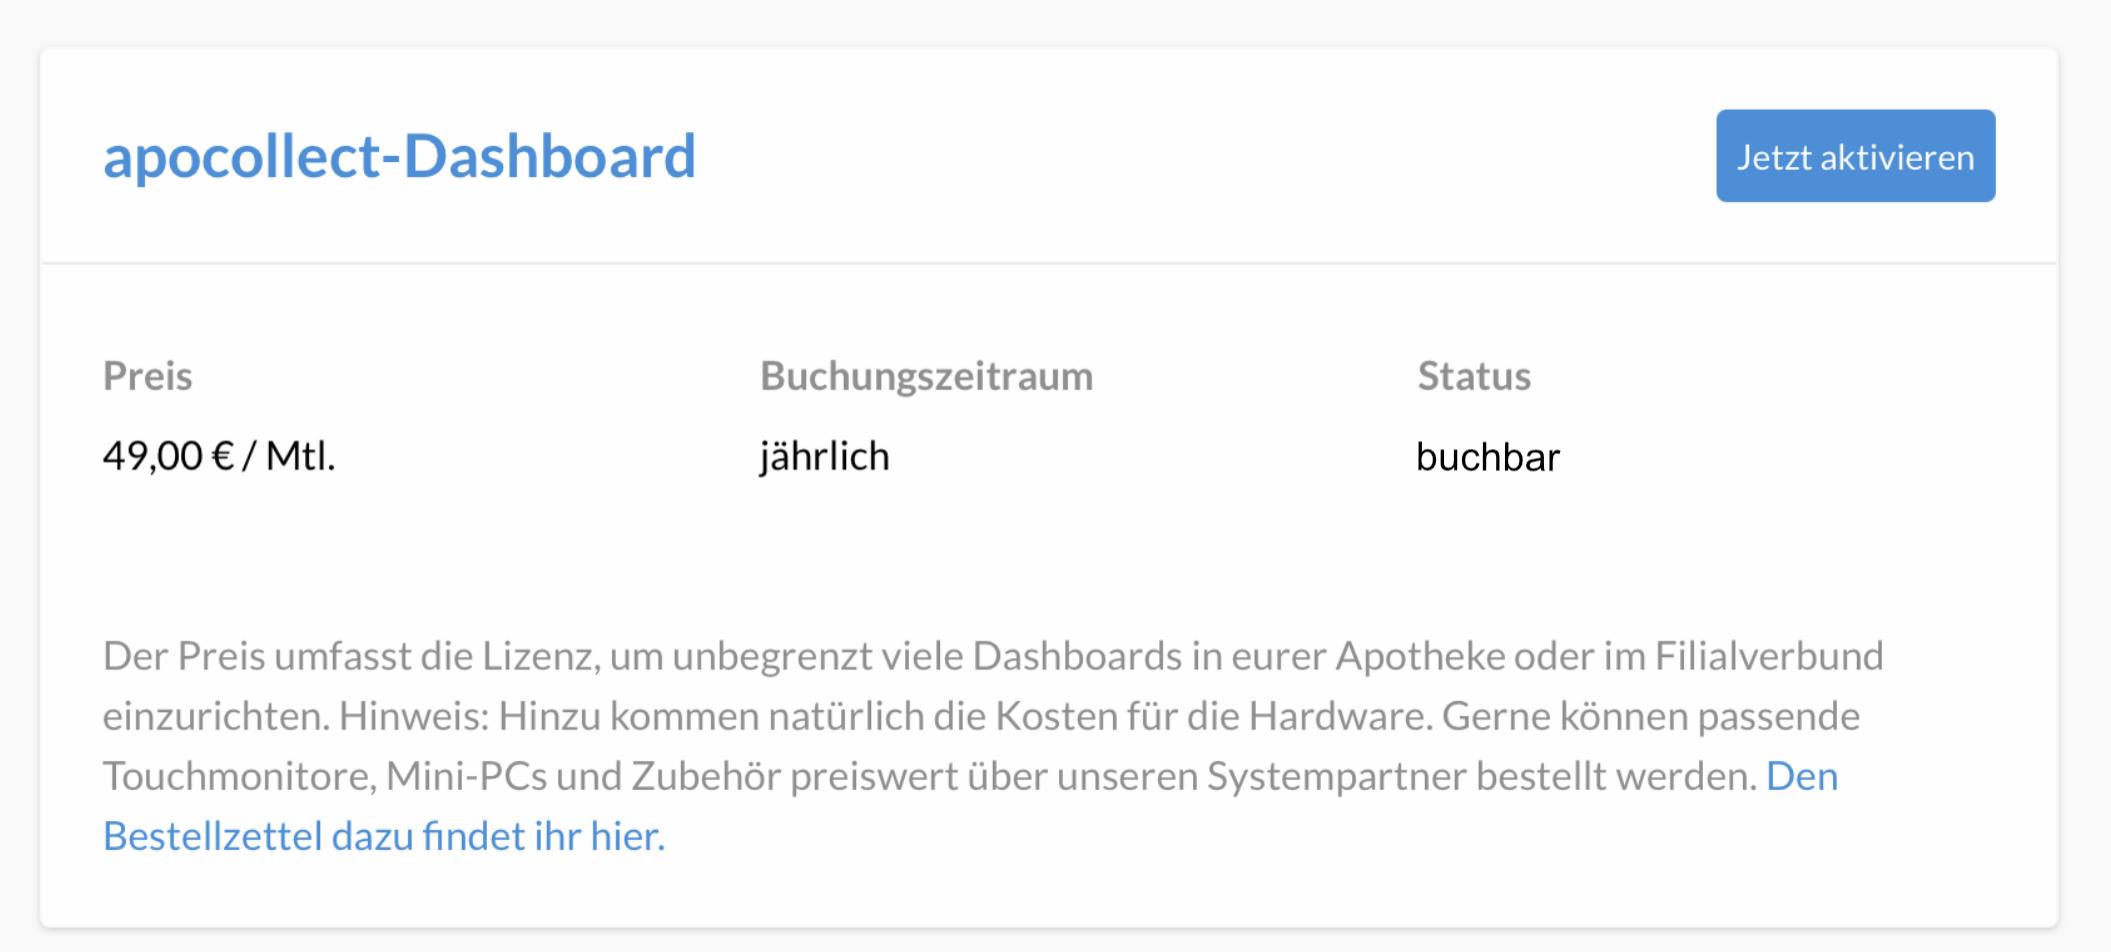 https://hilfe.apocollect.de/storage/images/faq/screenshots/dashboard-buchen.jpeg